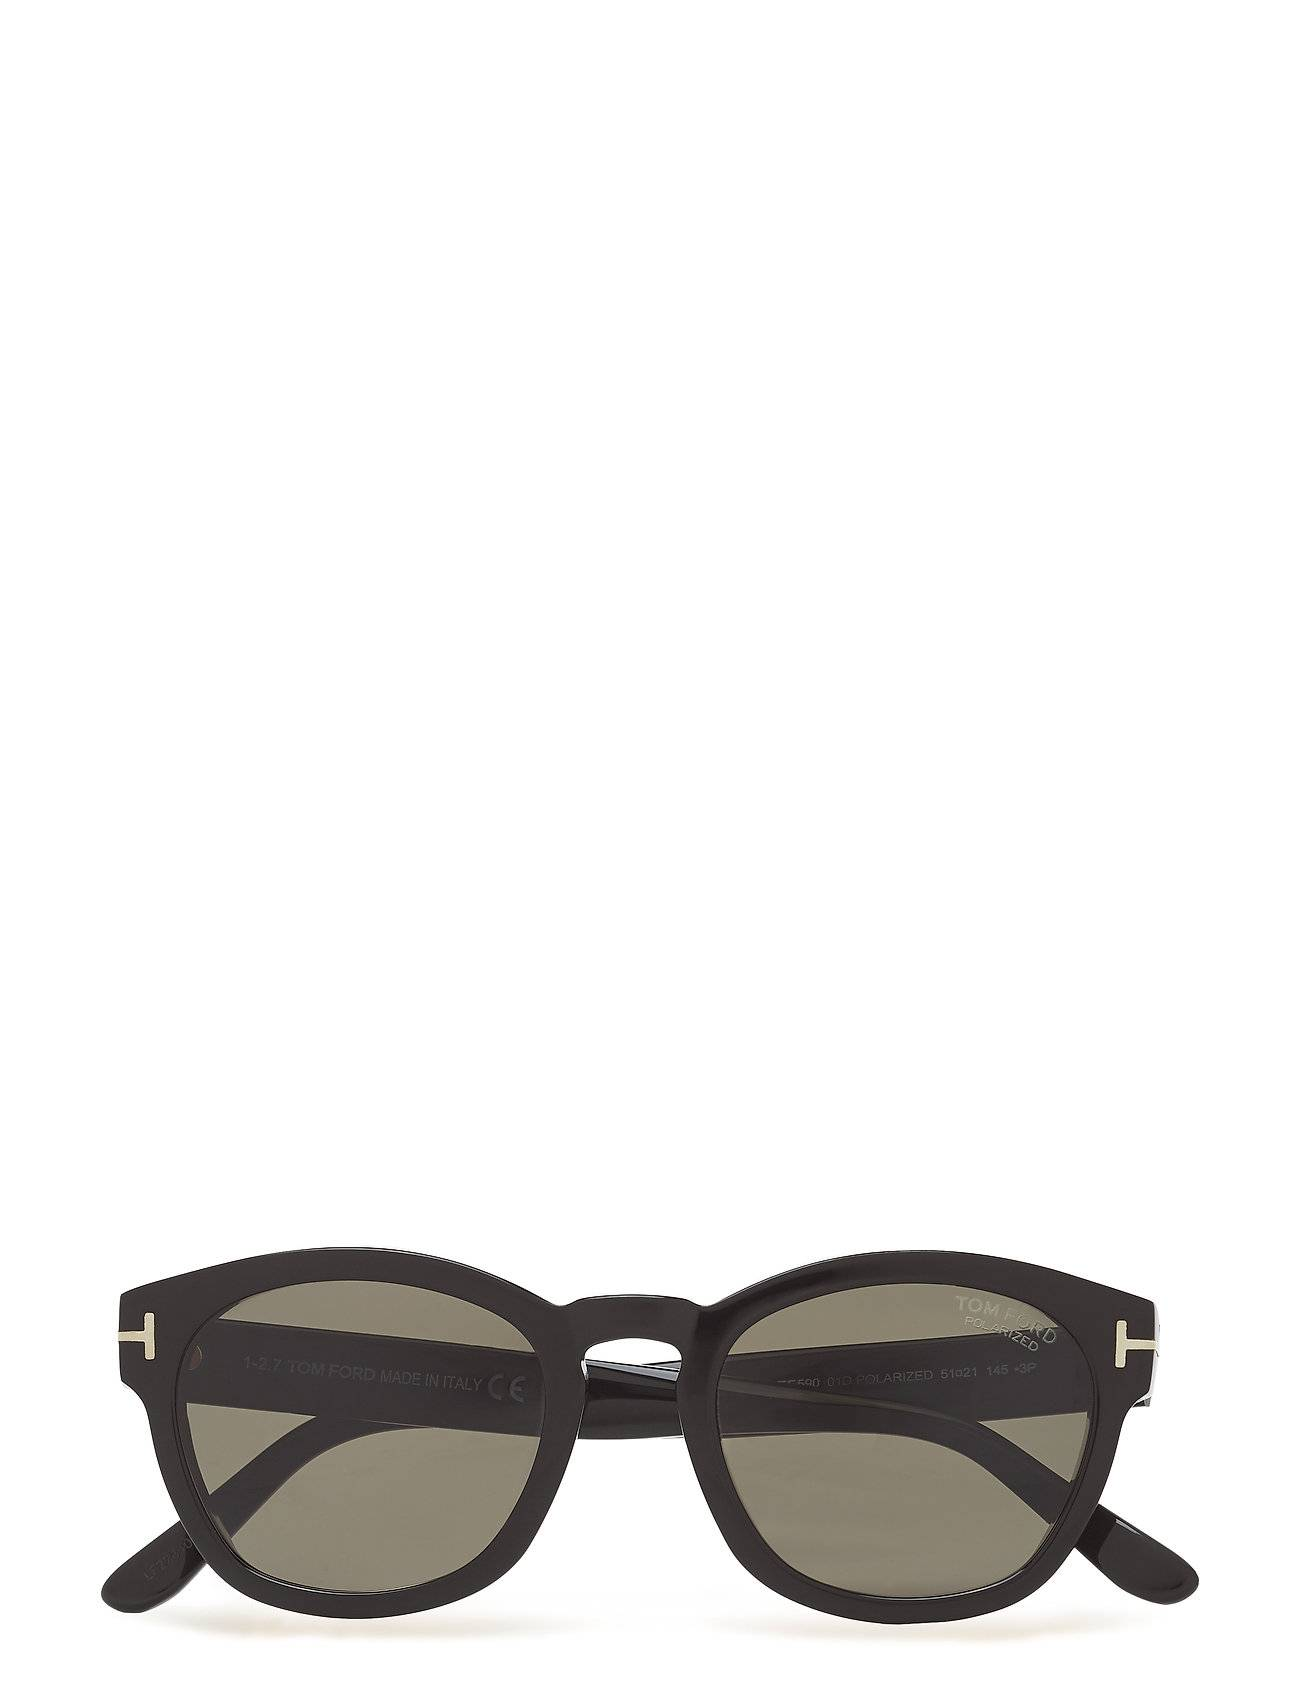 Image of Tom Ford Sunglasses Tom Ford Bryan-02 Wayfarer Aurinkolasit Musta Tom Ford Sunglasses